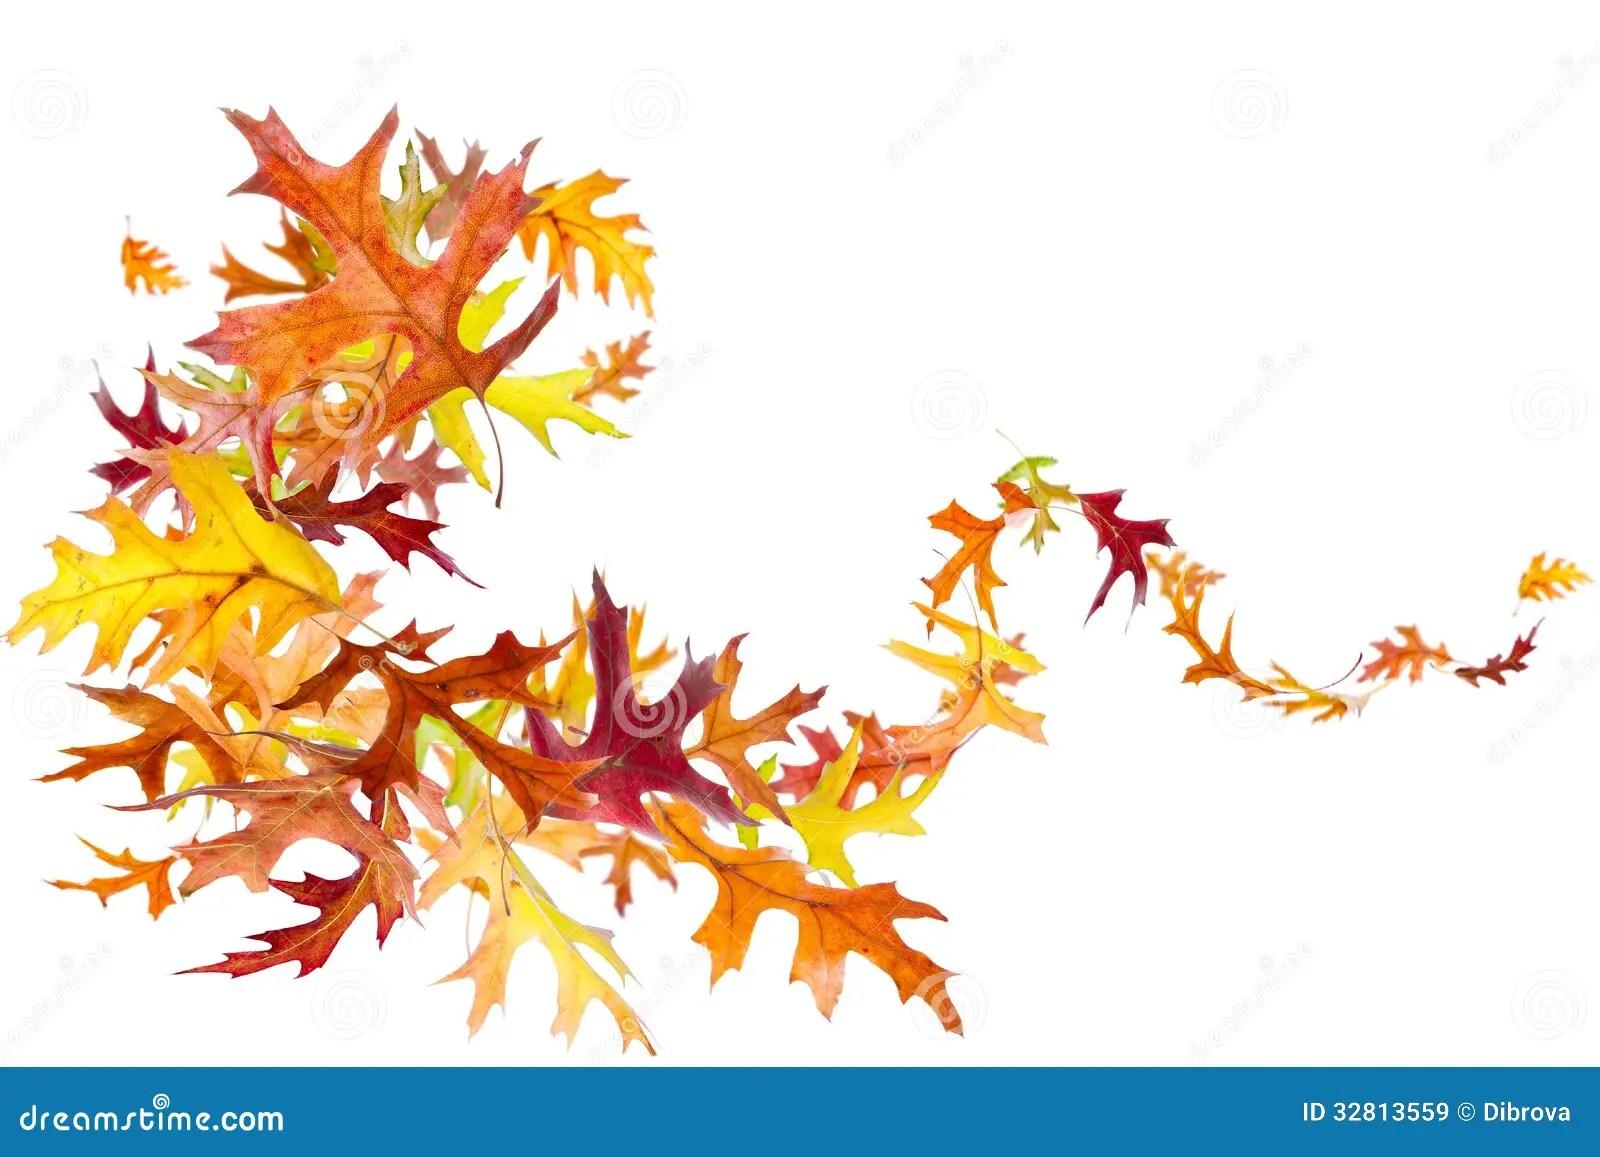 Wallpaper Border Falling Off Autumn Leaves Swirl Stock Image Image Of Vibrant